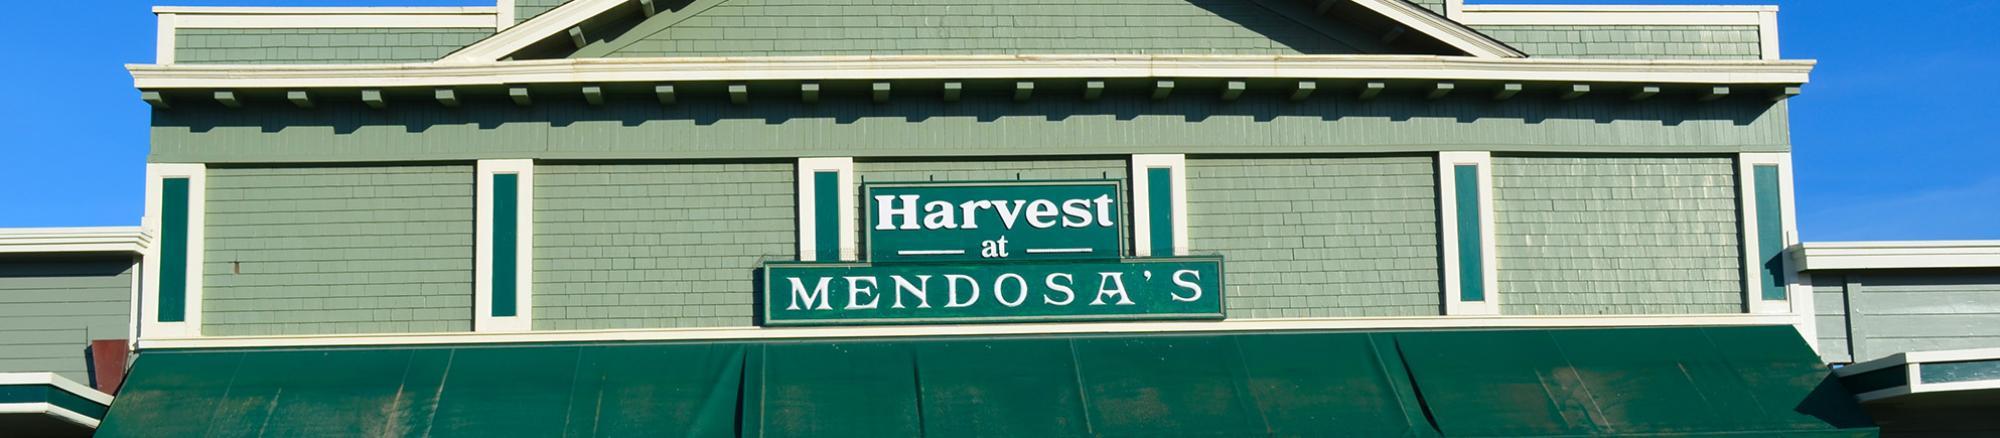 Harvest at Mendosa's